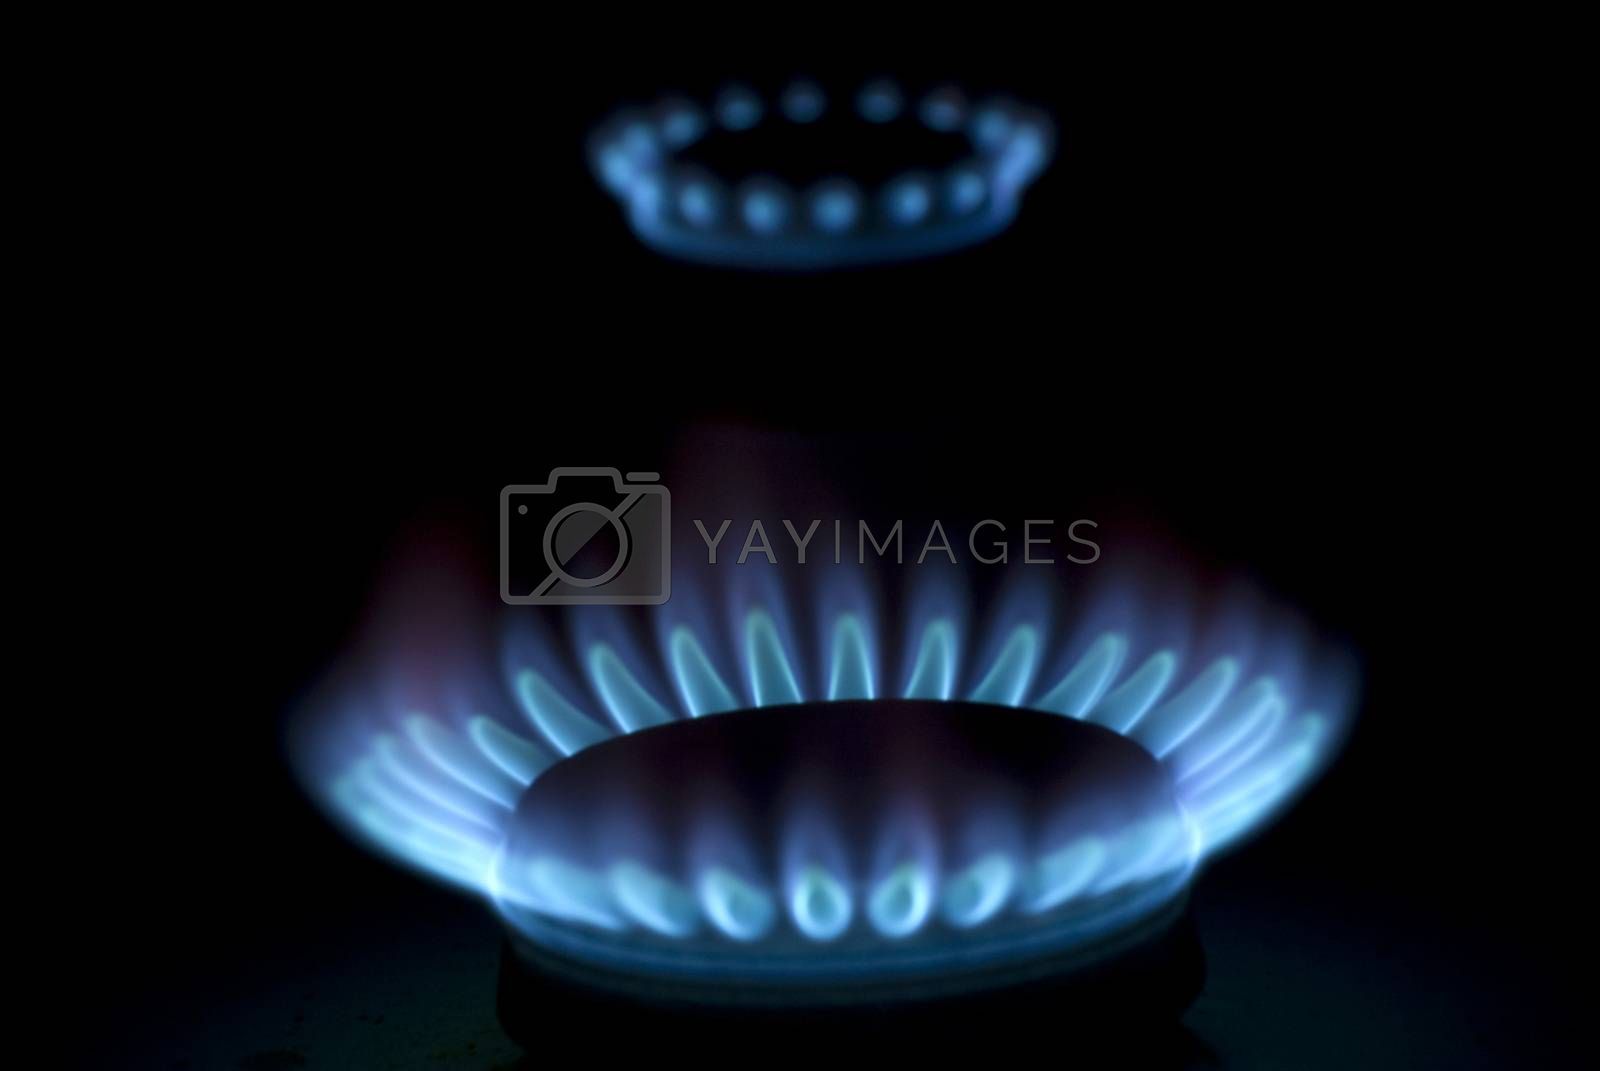 Royalty free image of flames of gas by Pakhnyushchyy